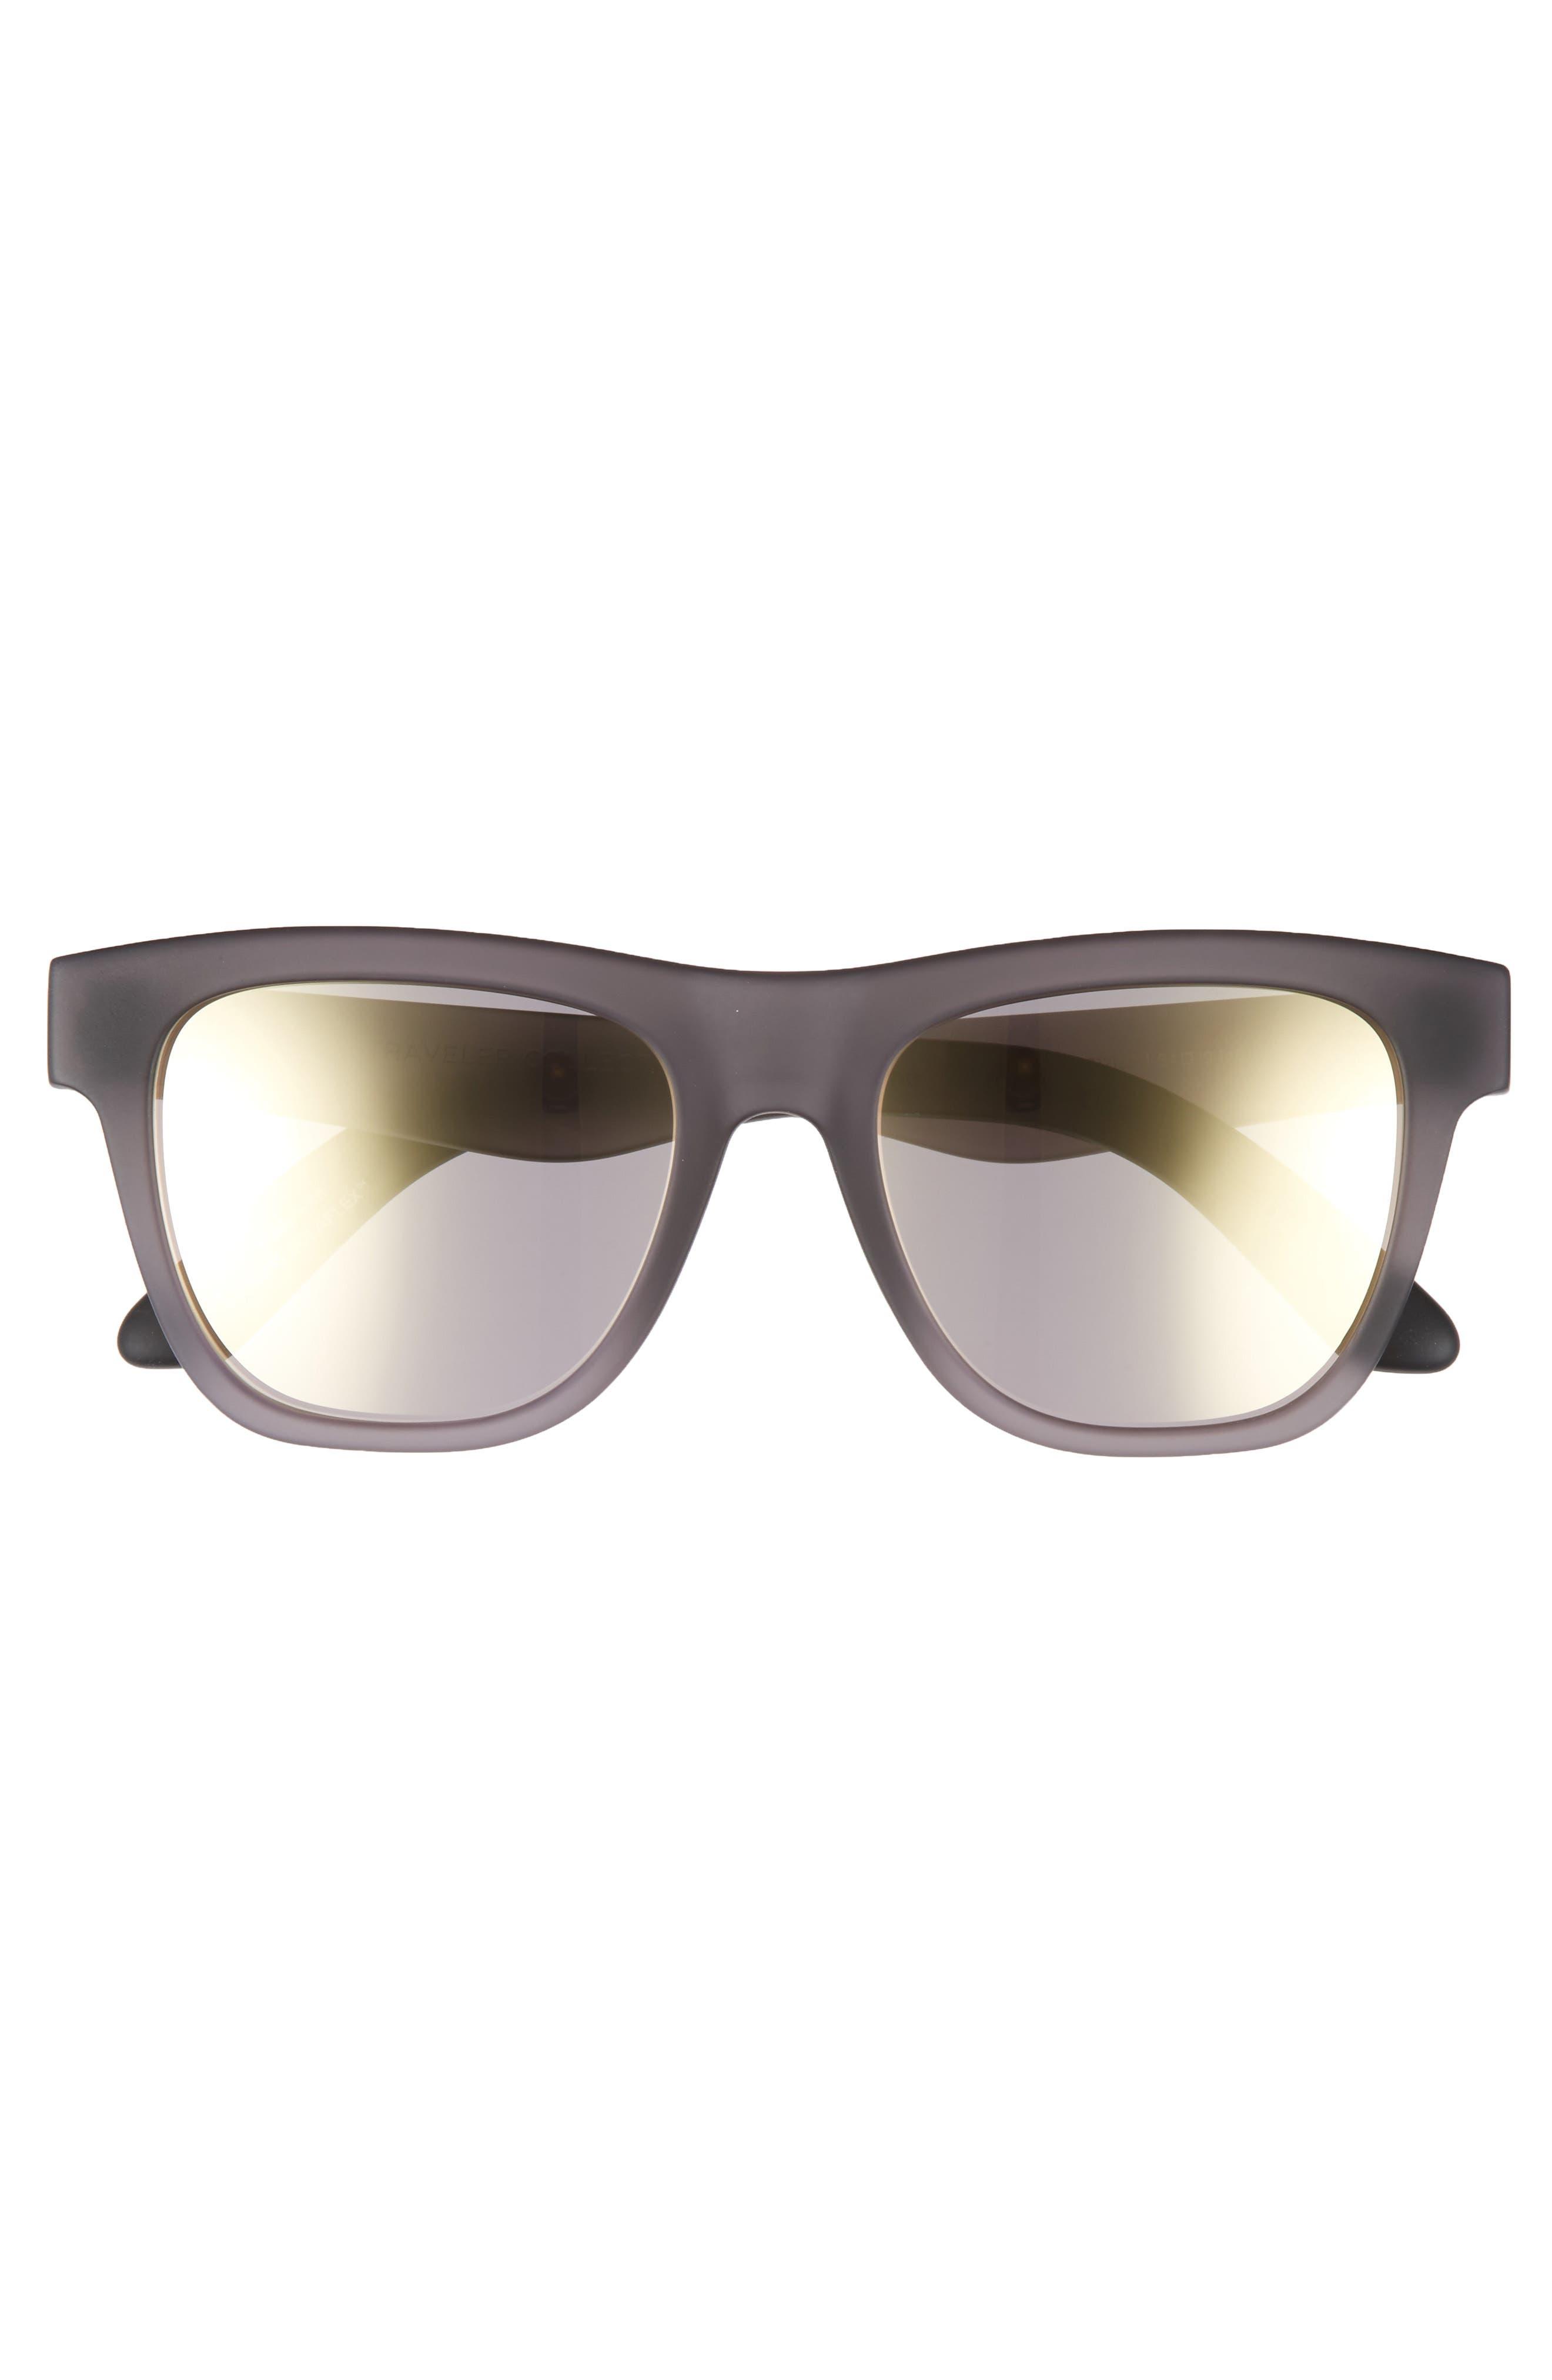 Dalston 54mm Sunglasses,                             Alternate thumbnail 2, color,                             Pewter